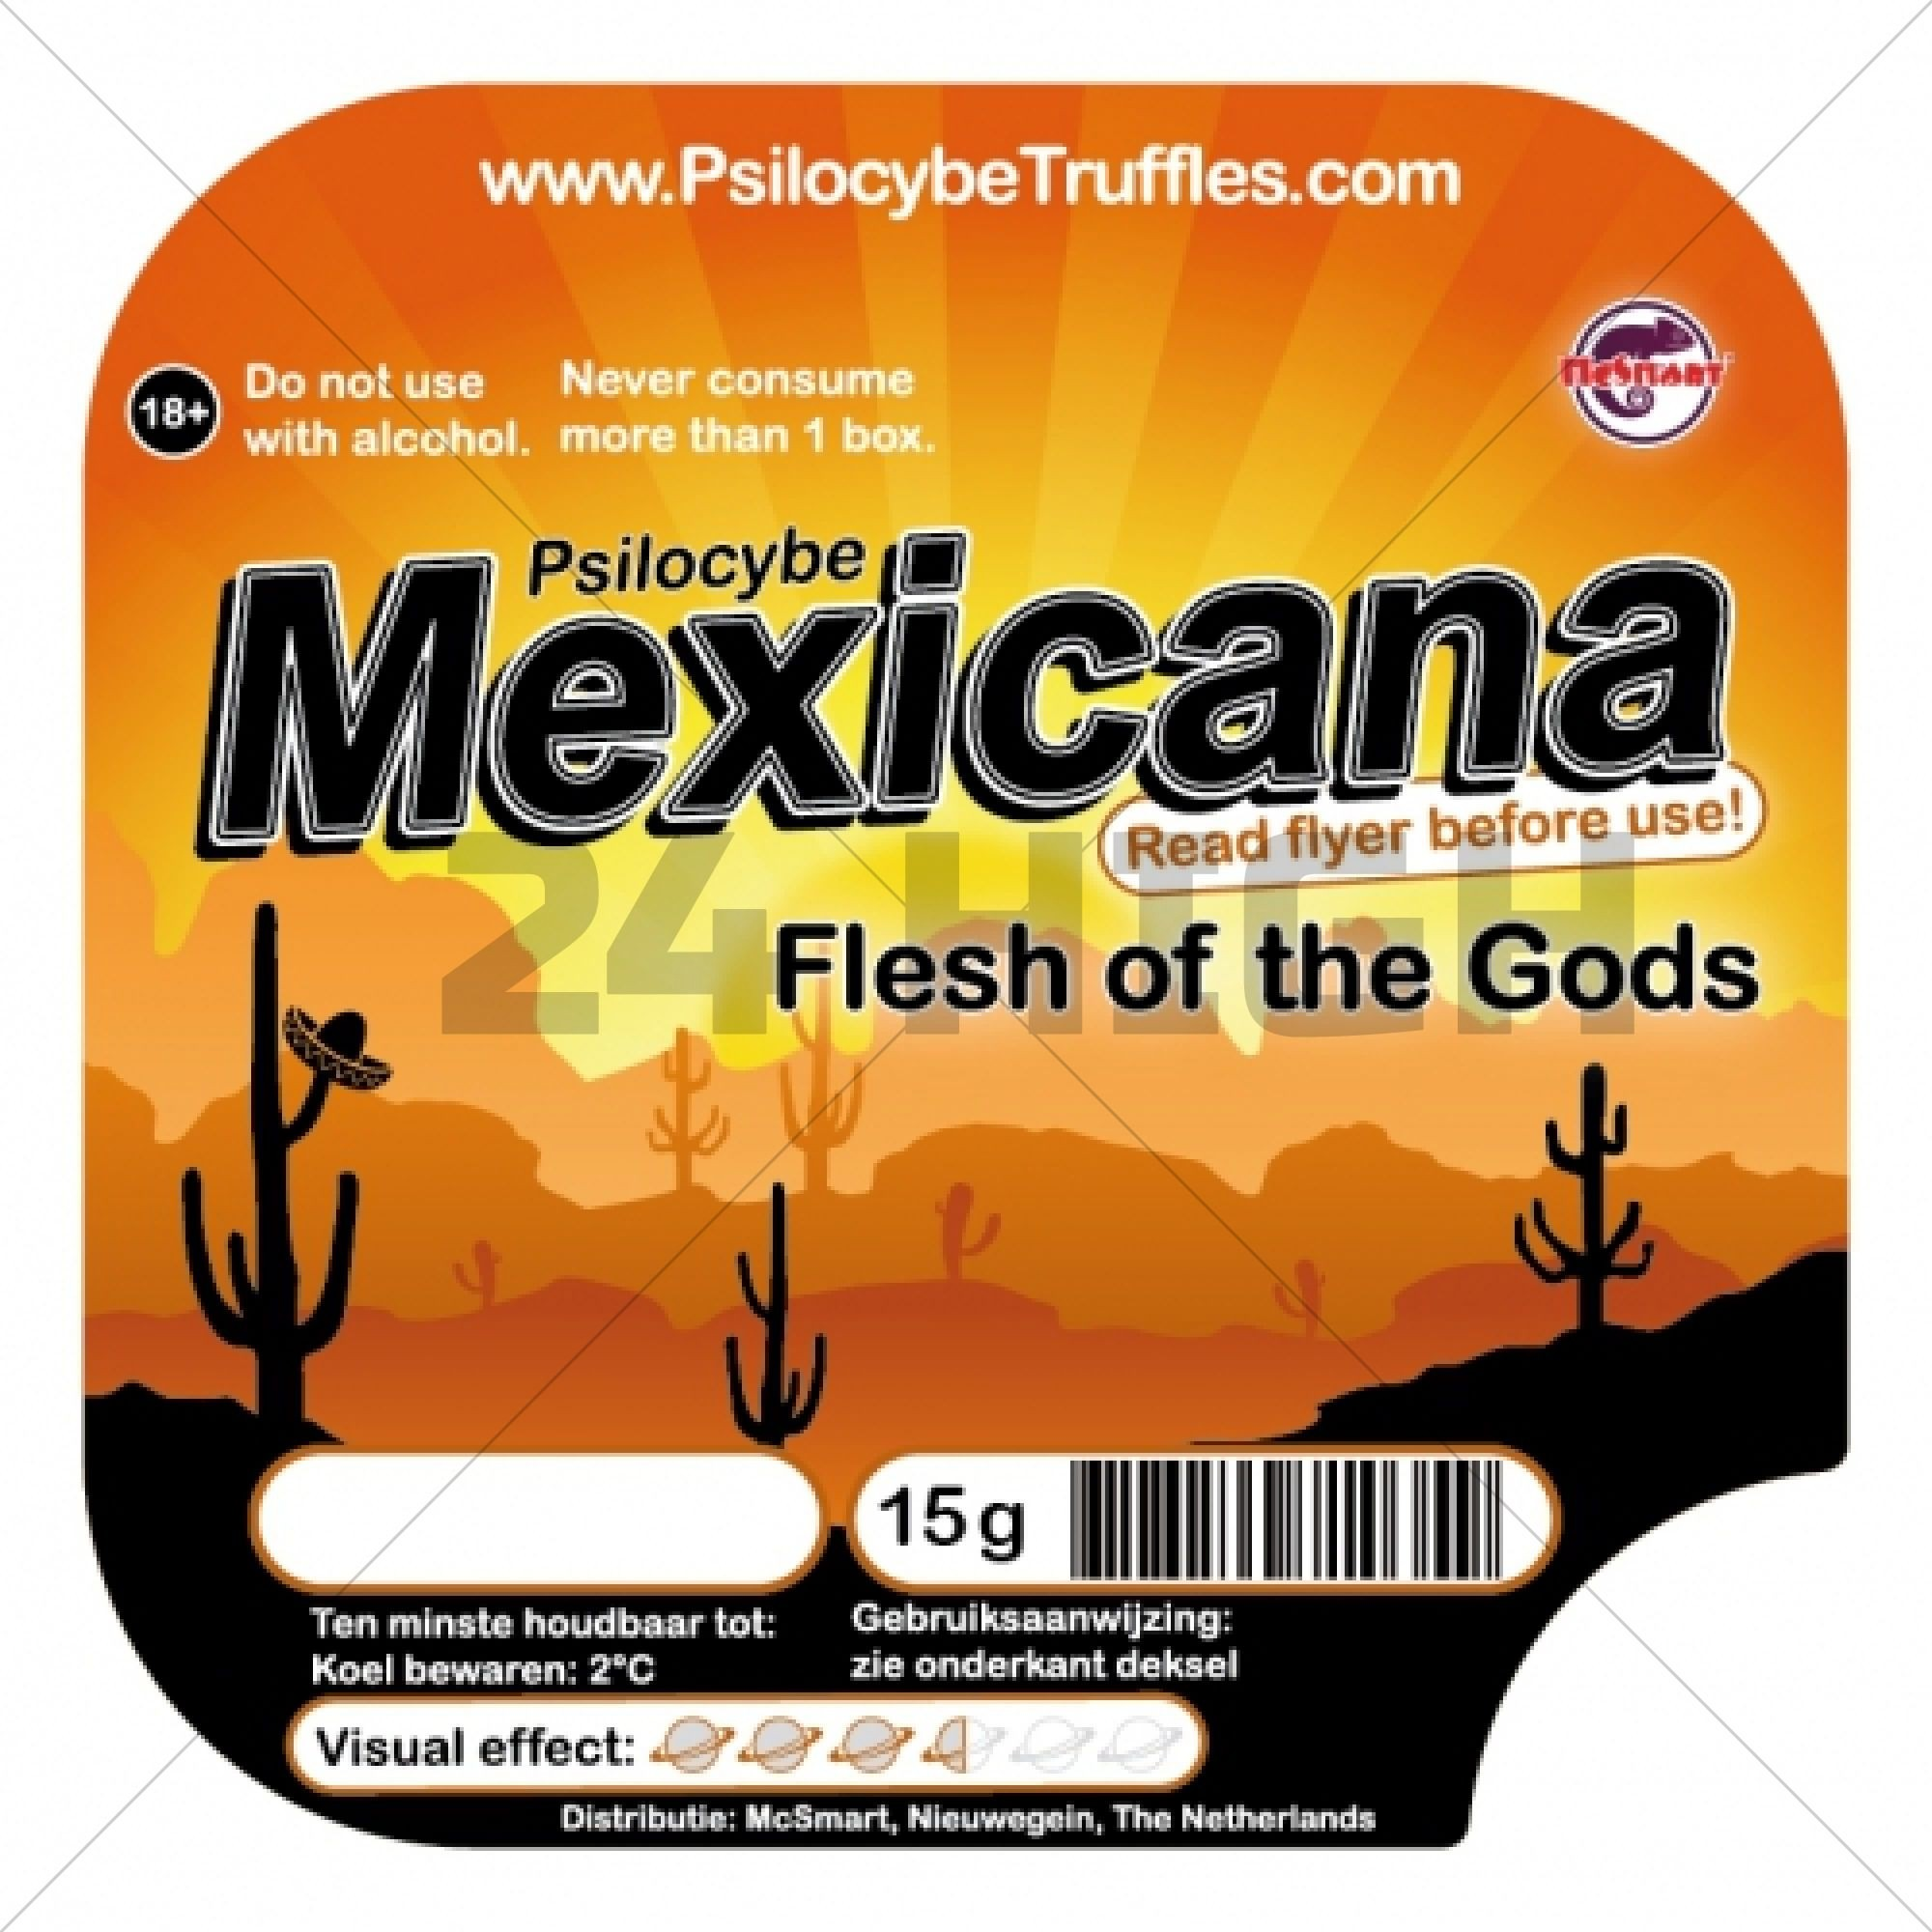 Mexicana Truffels